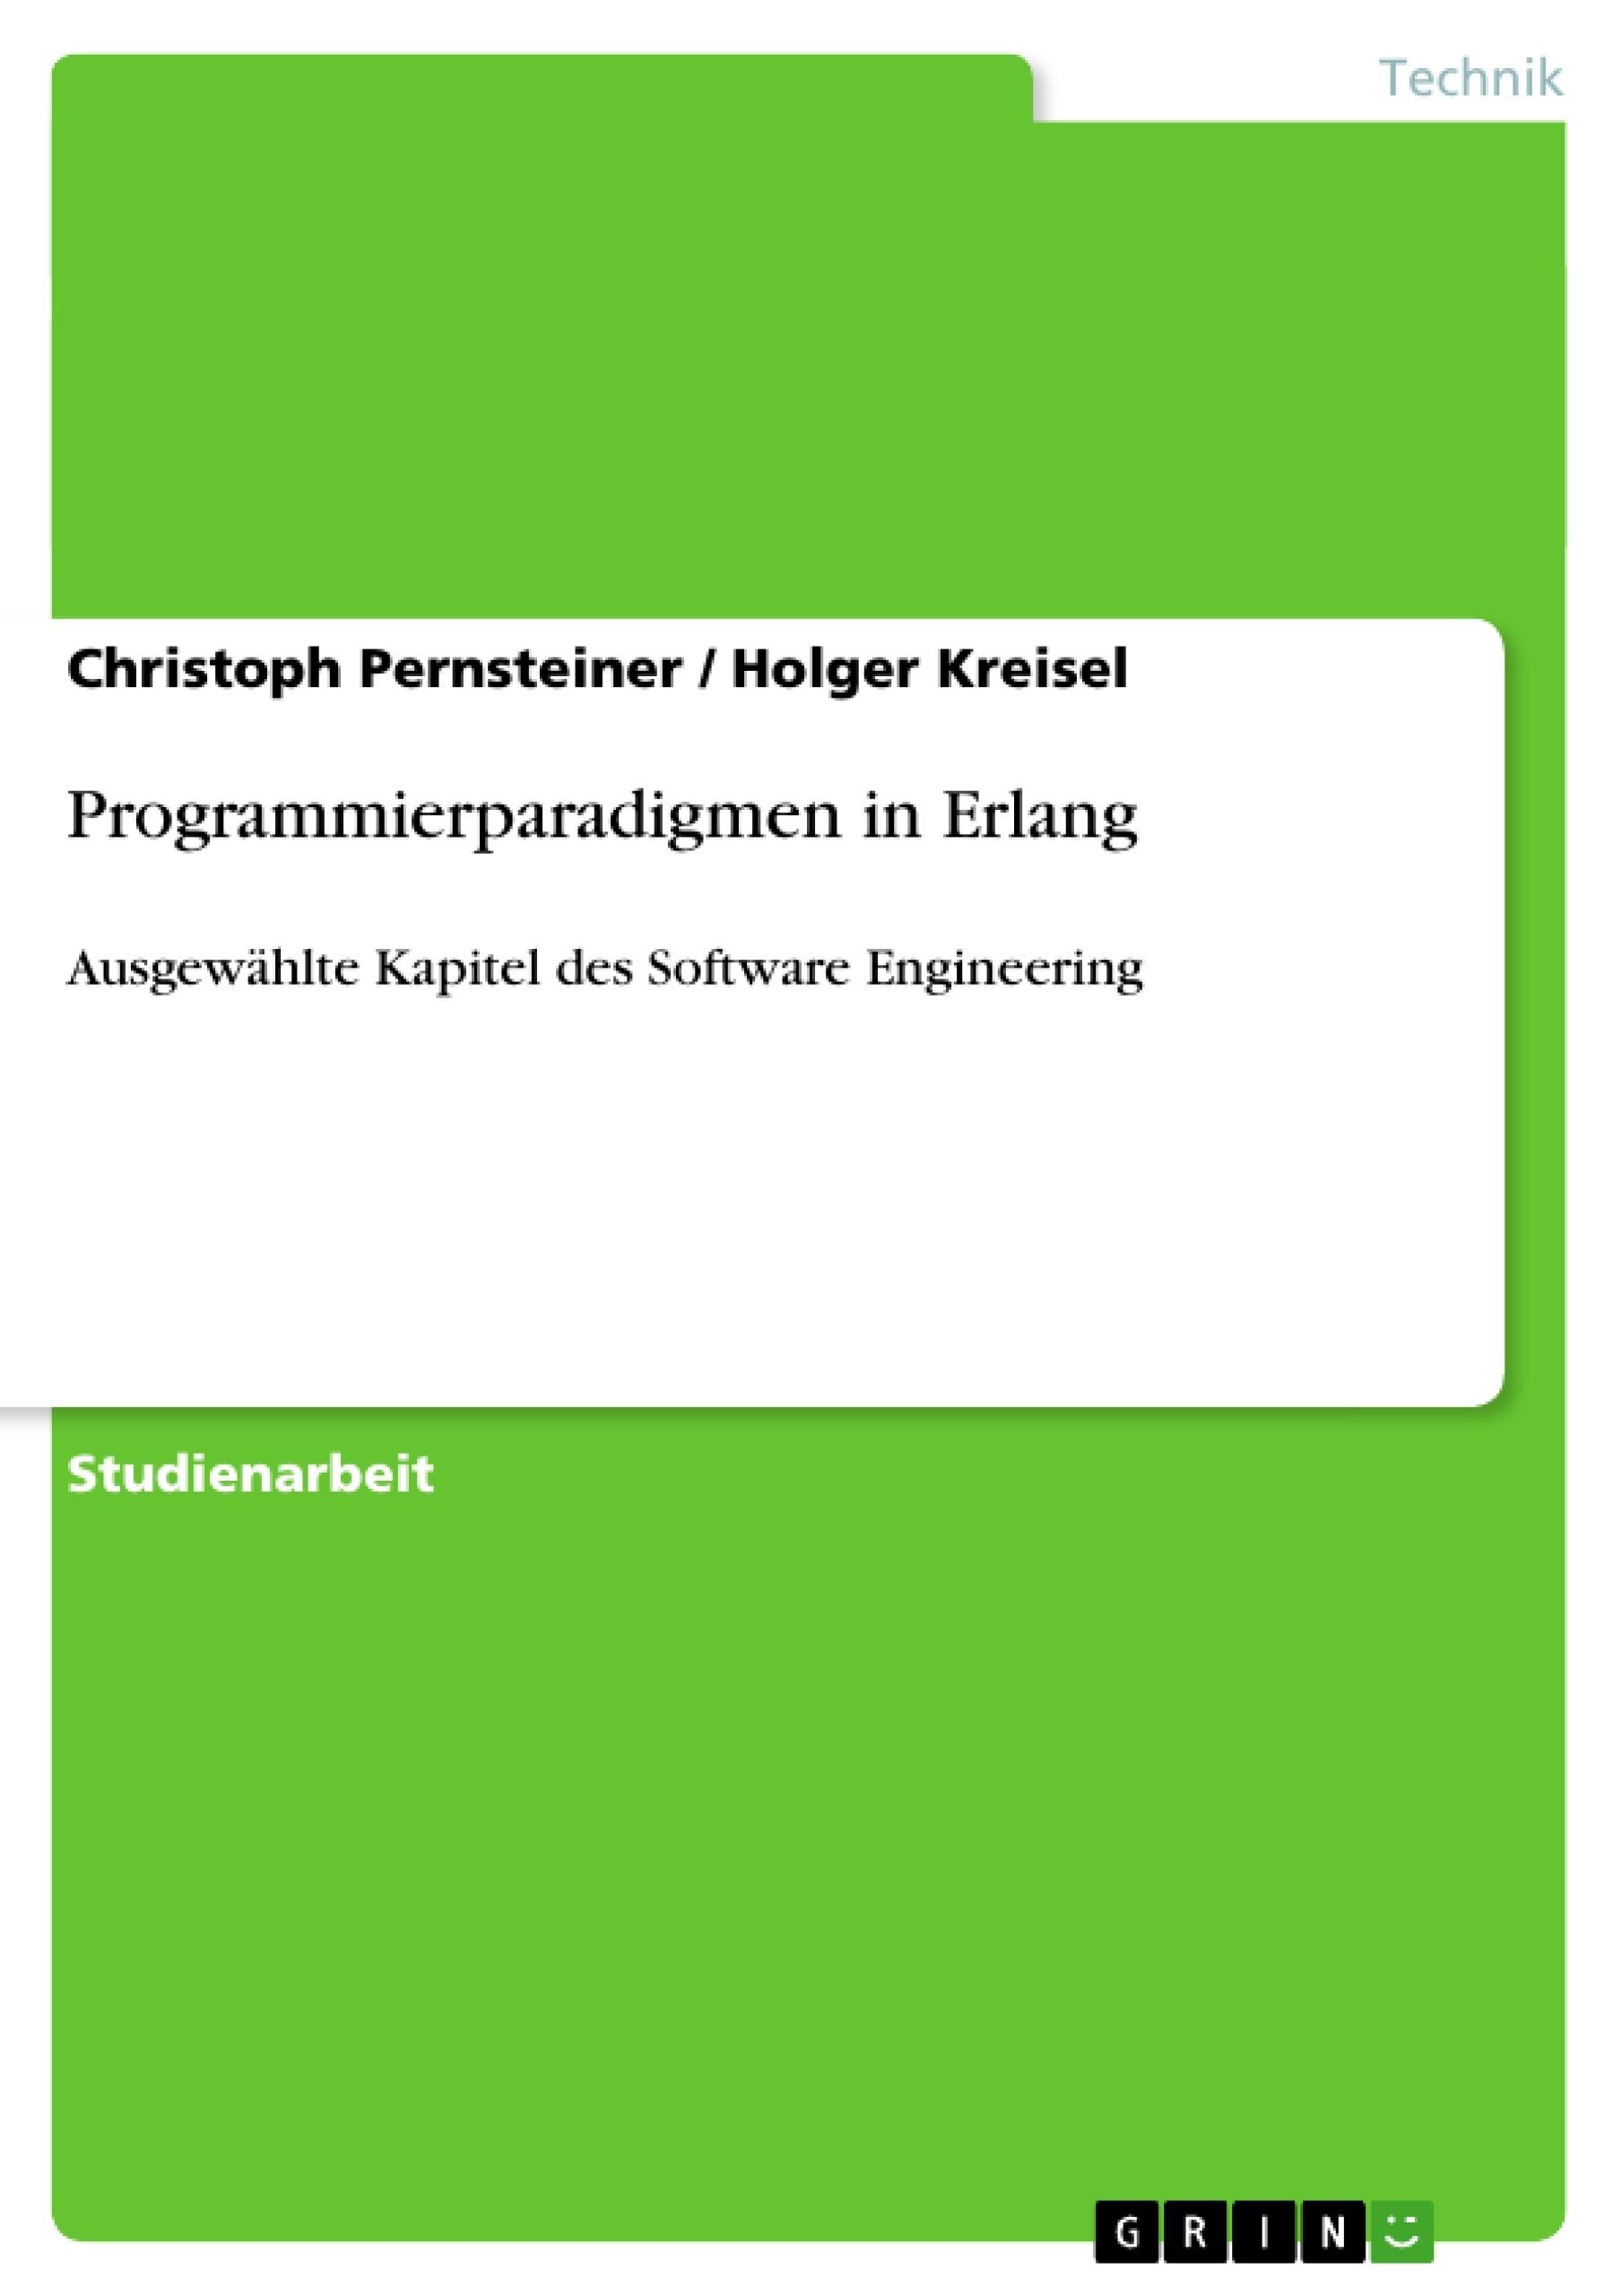 Titel: Programmierparadigmen in Erlang